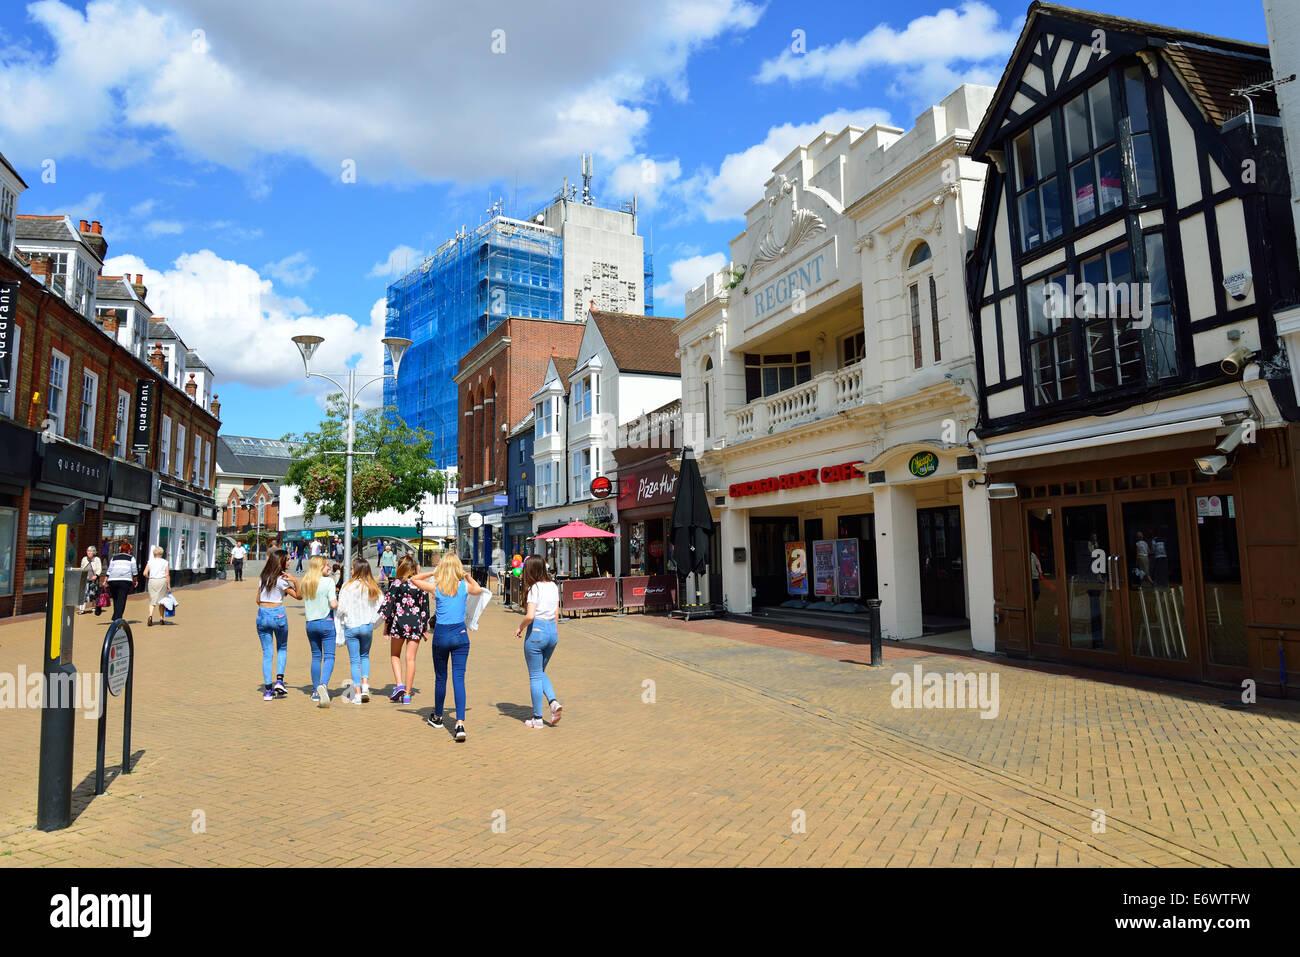 Chelmsford essex united kingdom